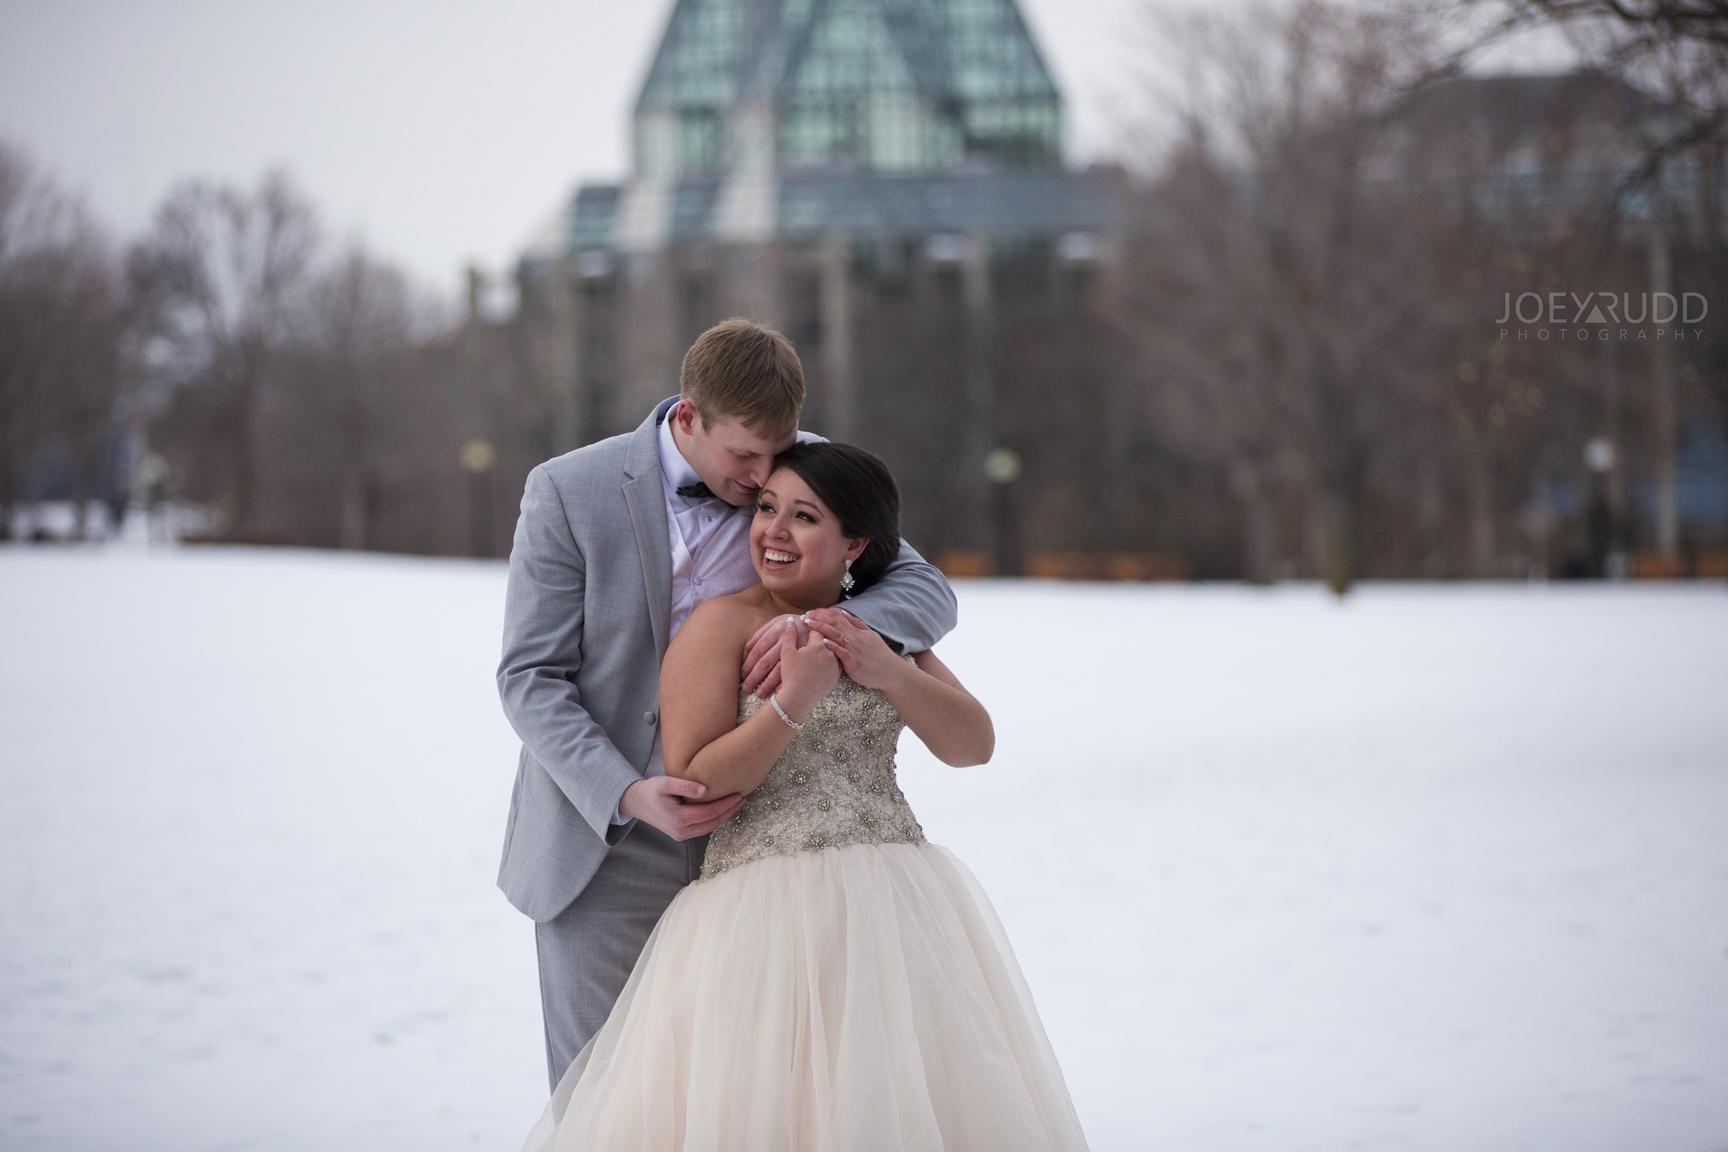 Ottawa Winter Wedding at the NAC by Joey Rudd Photography